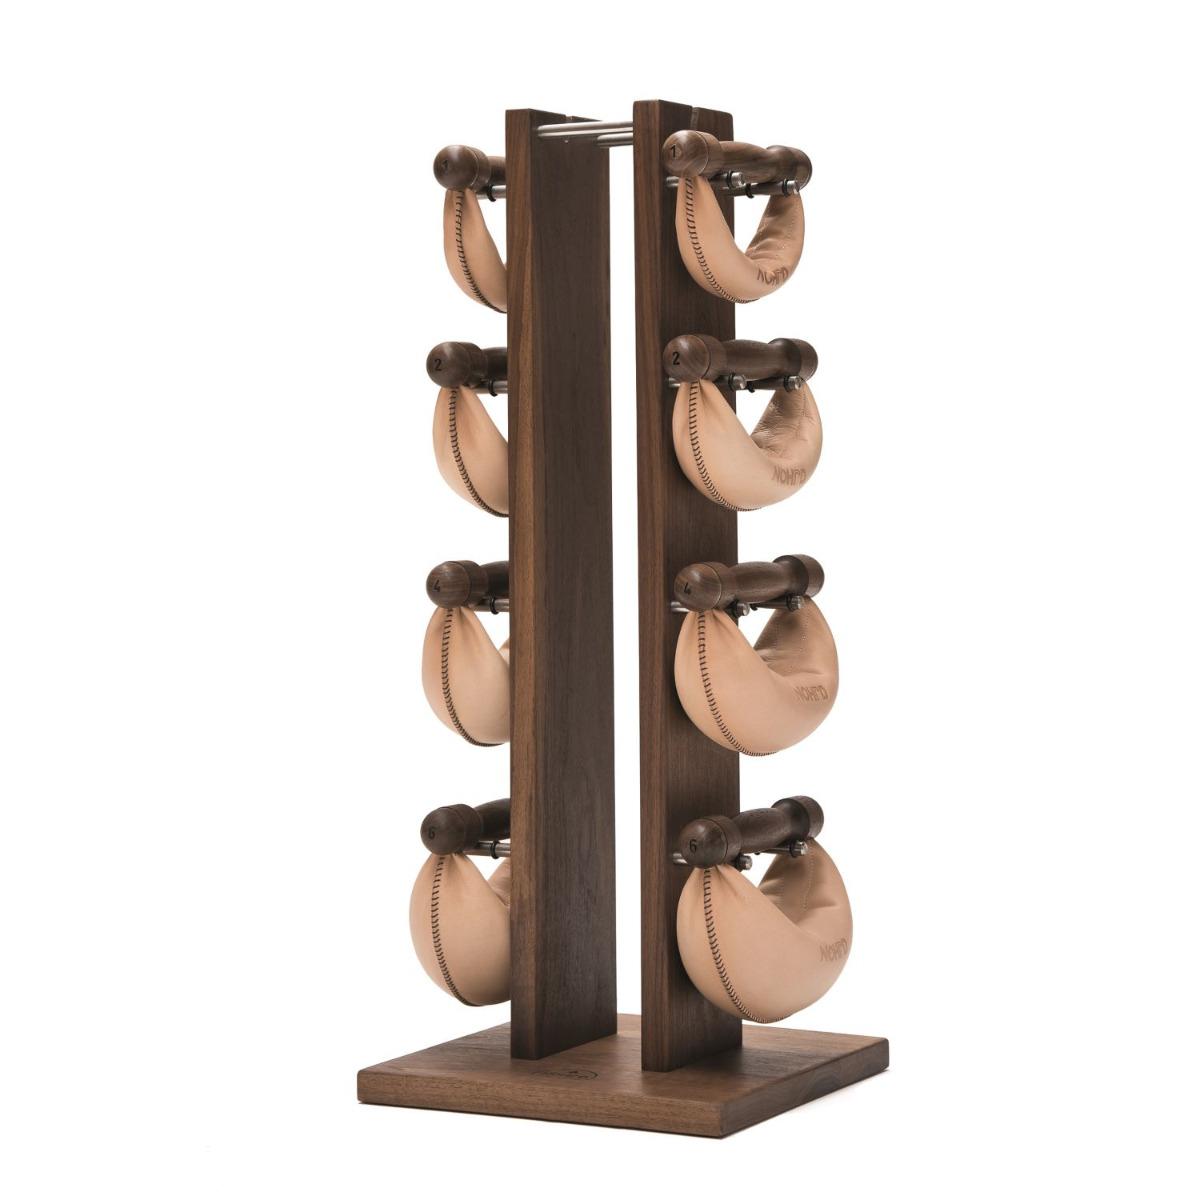 NOHrD Swing Bells & Tower Set - Walnut (Classic)